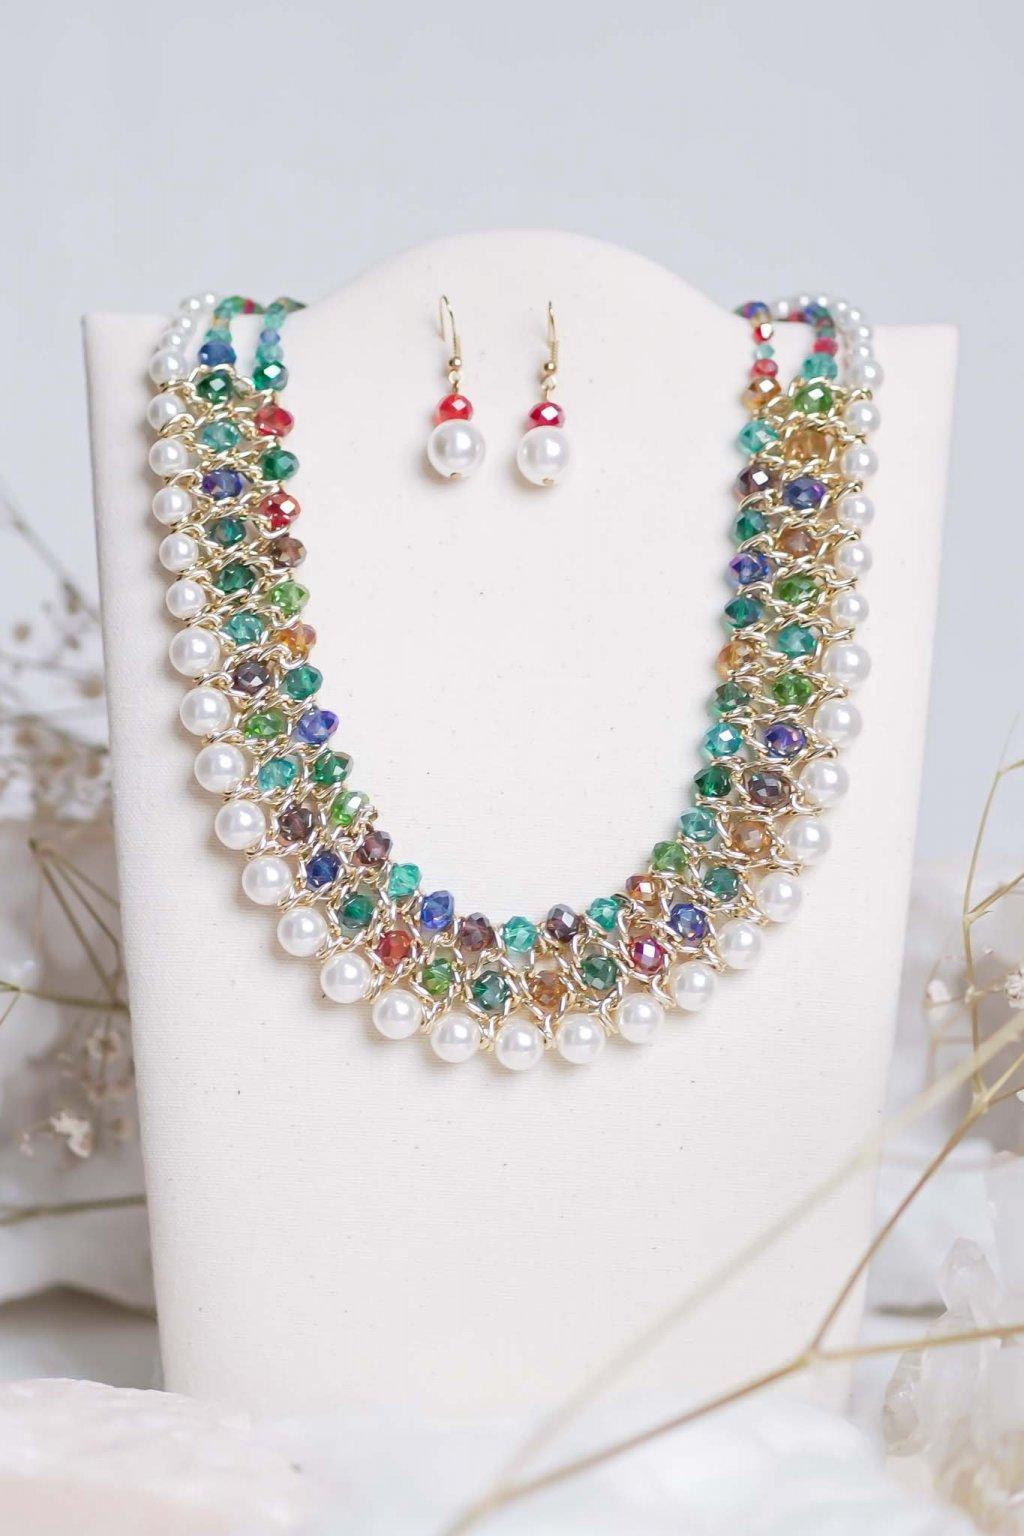 náhrdelník, šperk, spoločenská náhrdelník, náhrdelník na bežný deň, výrazný náhrdelník, jemný náhrdelník, šperky, náhrdelník na ples, svadbu, stužkovú 36